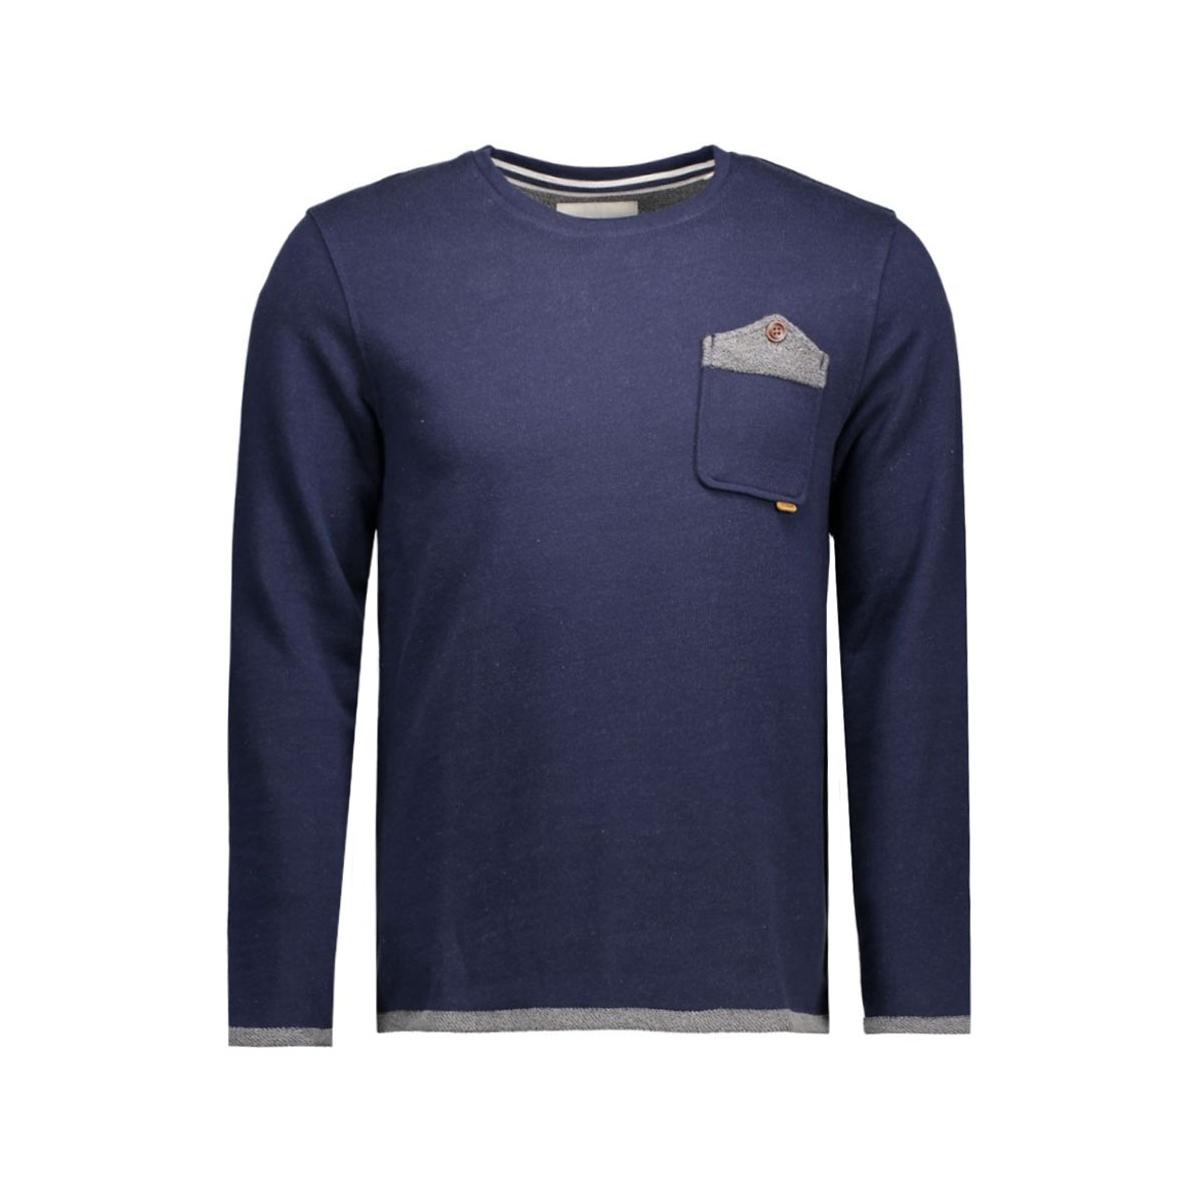 106cc2j004 edc sweater c400